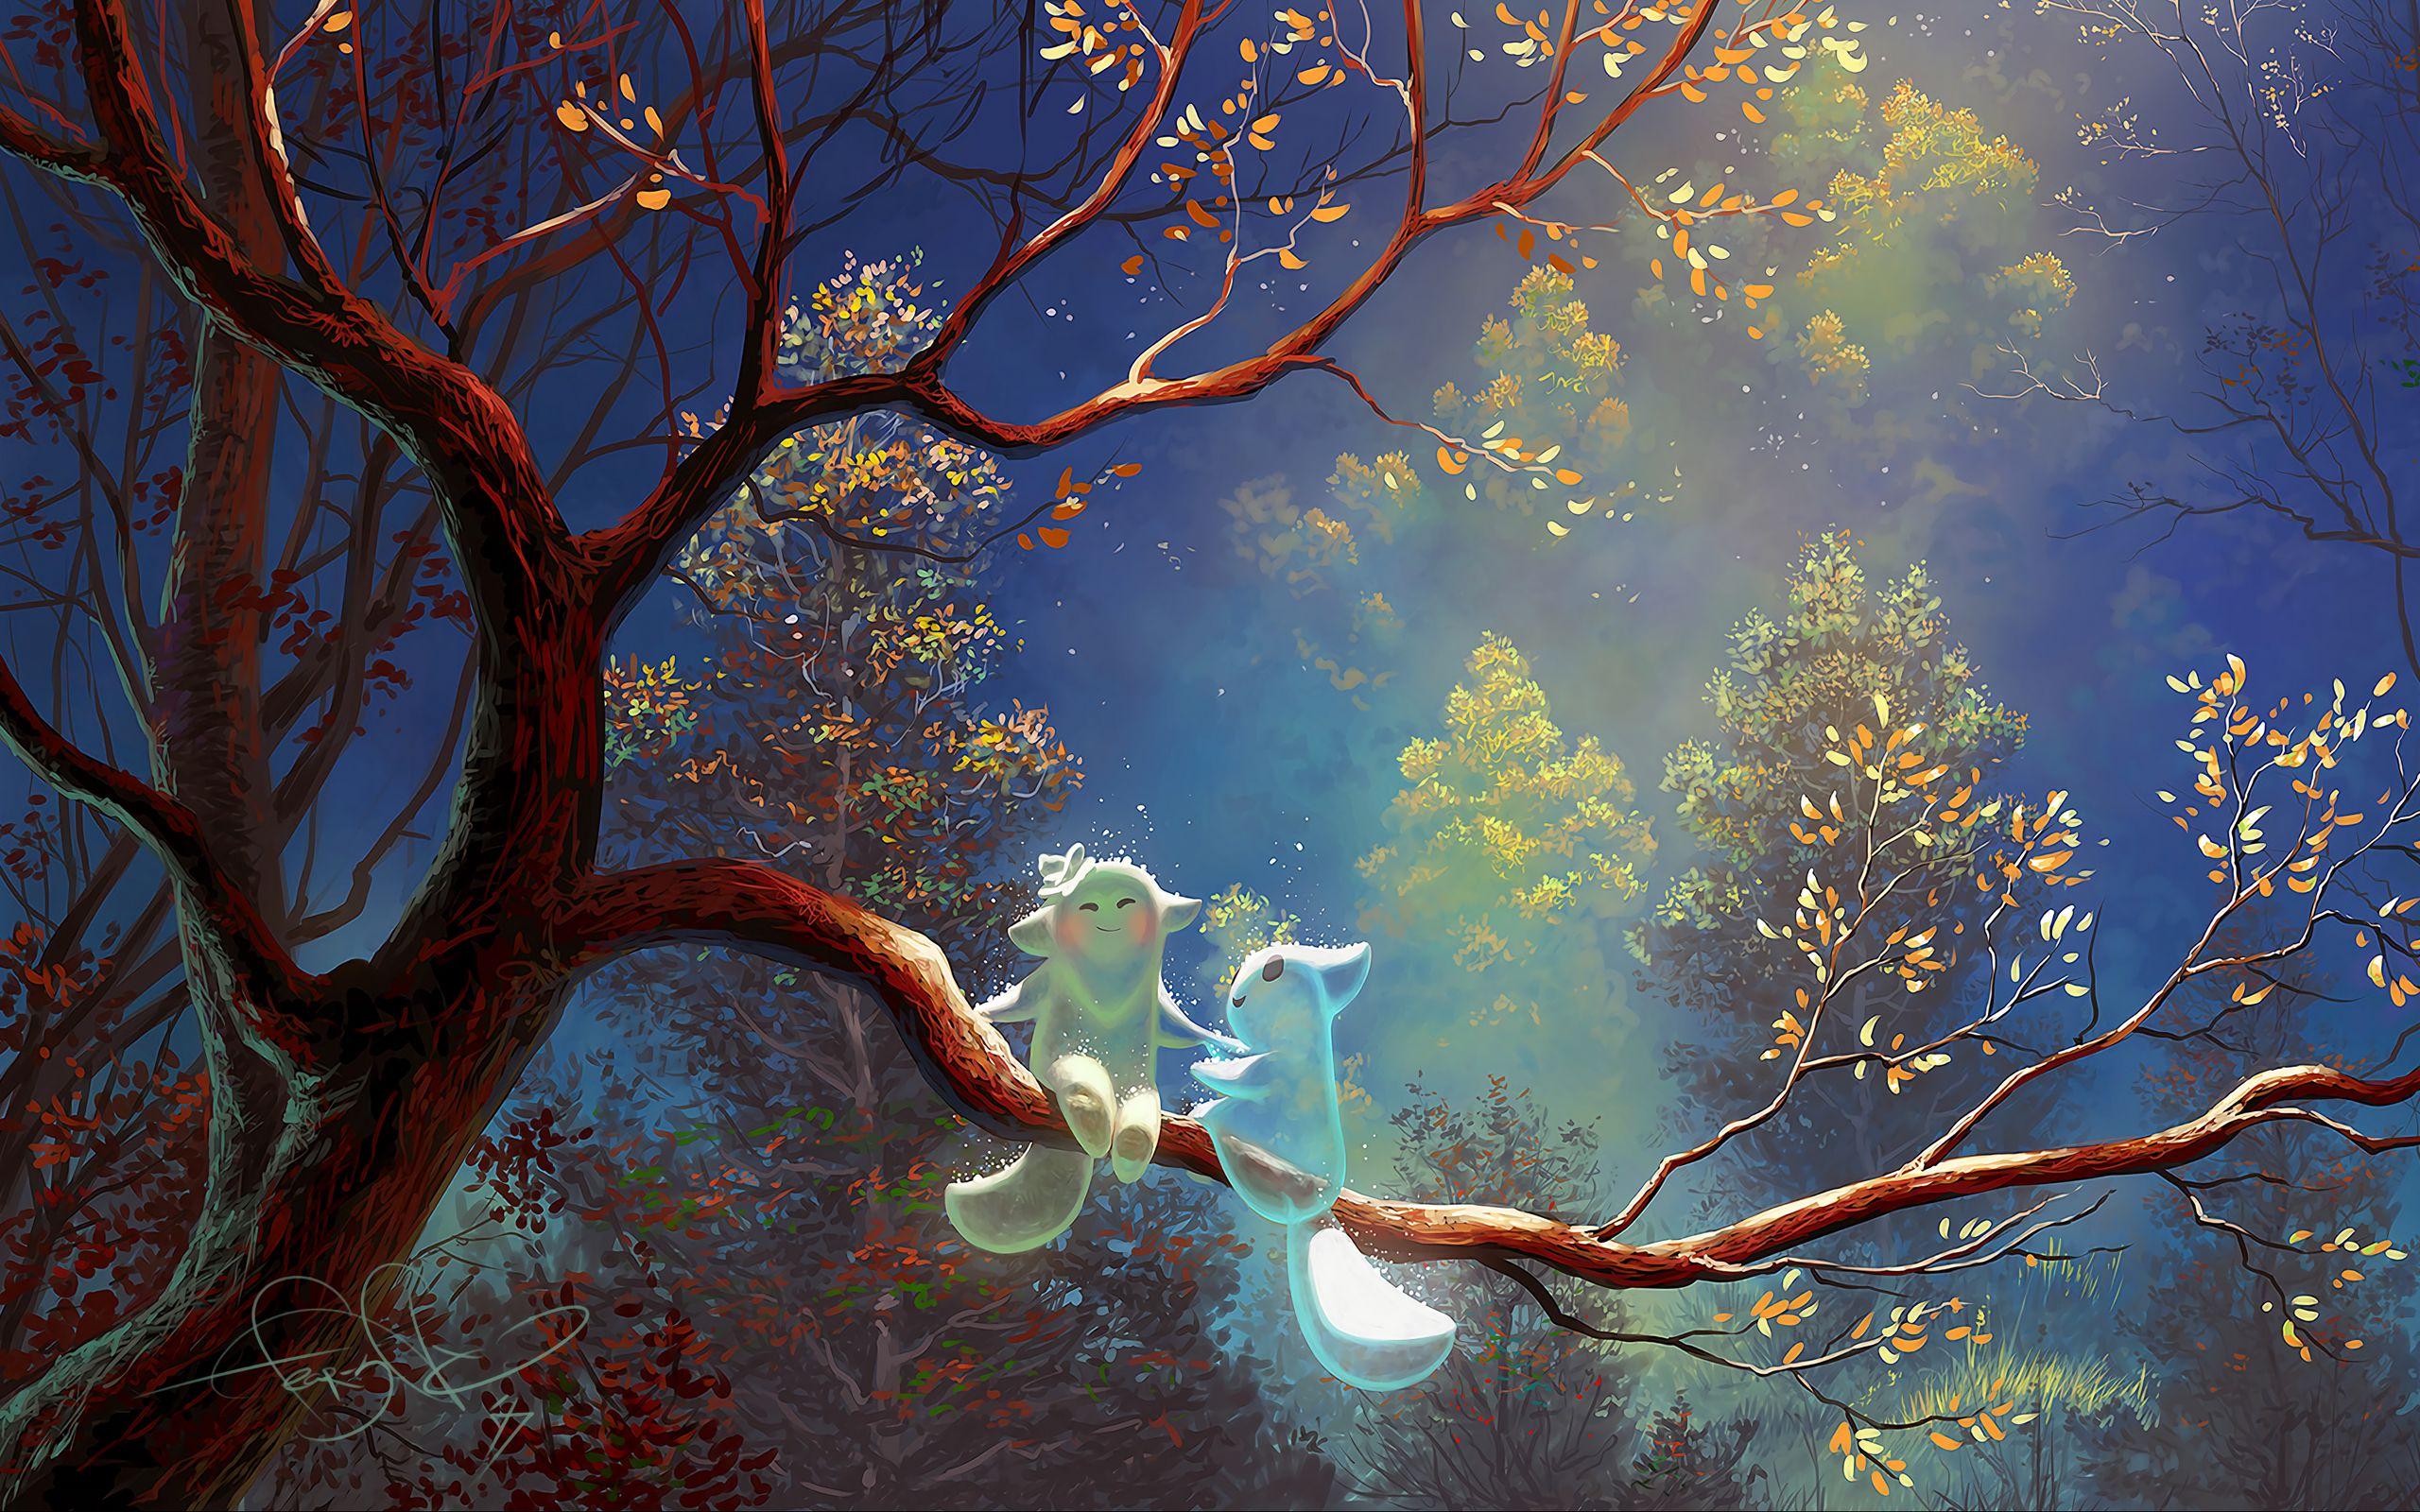 2560x1600 Wallpaper animals, tree, branch, magic, art, fantasy